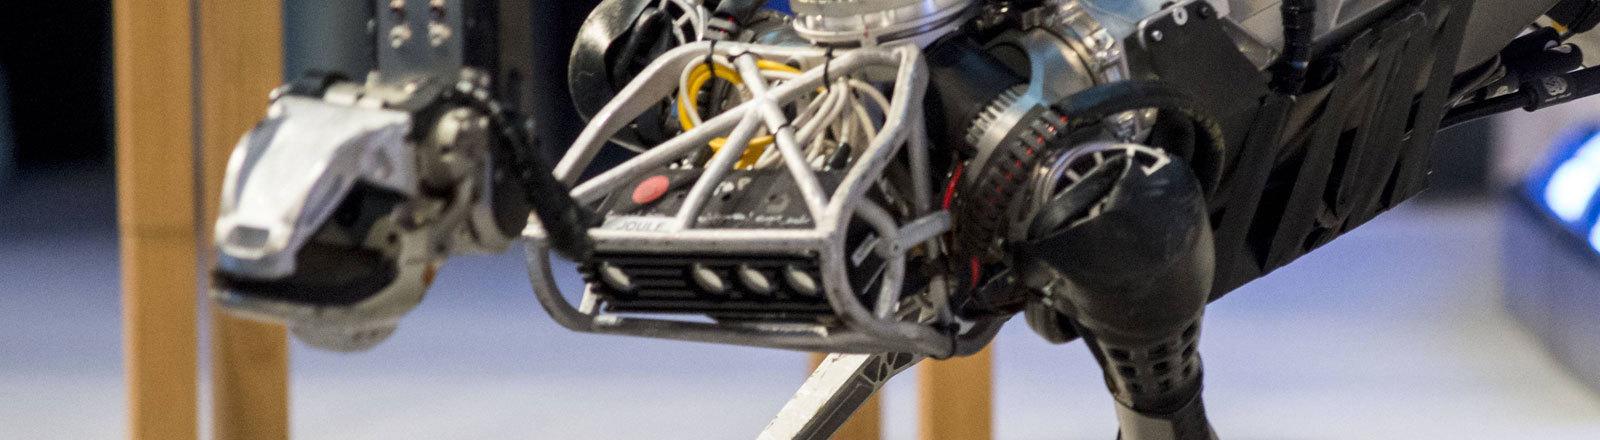 Der Roboter SpotMini von Boston Dynamics